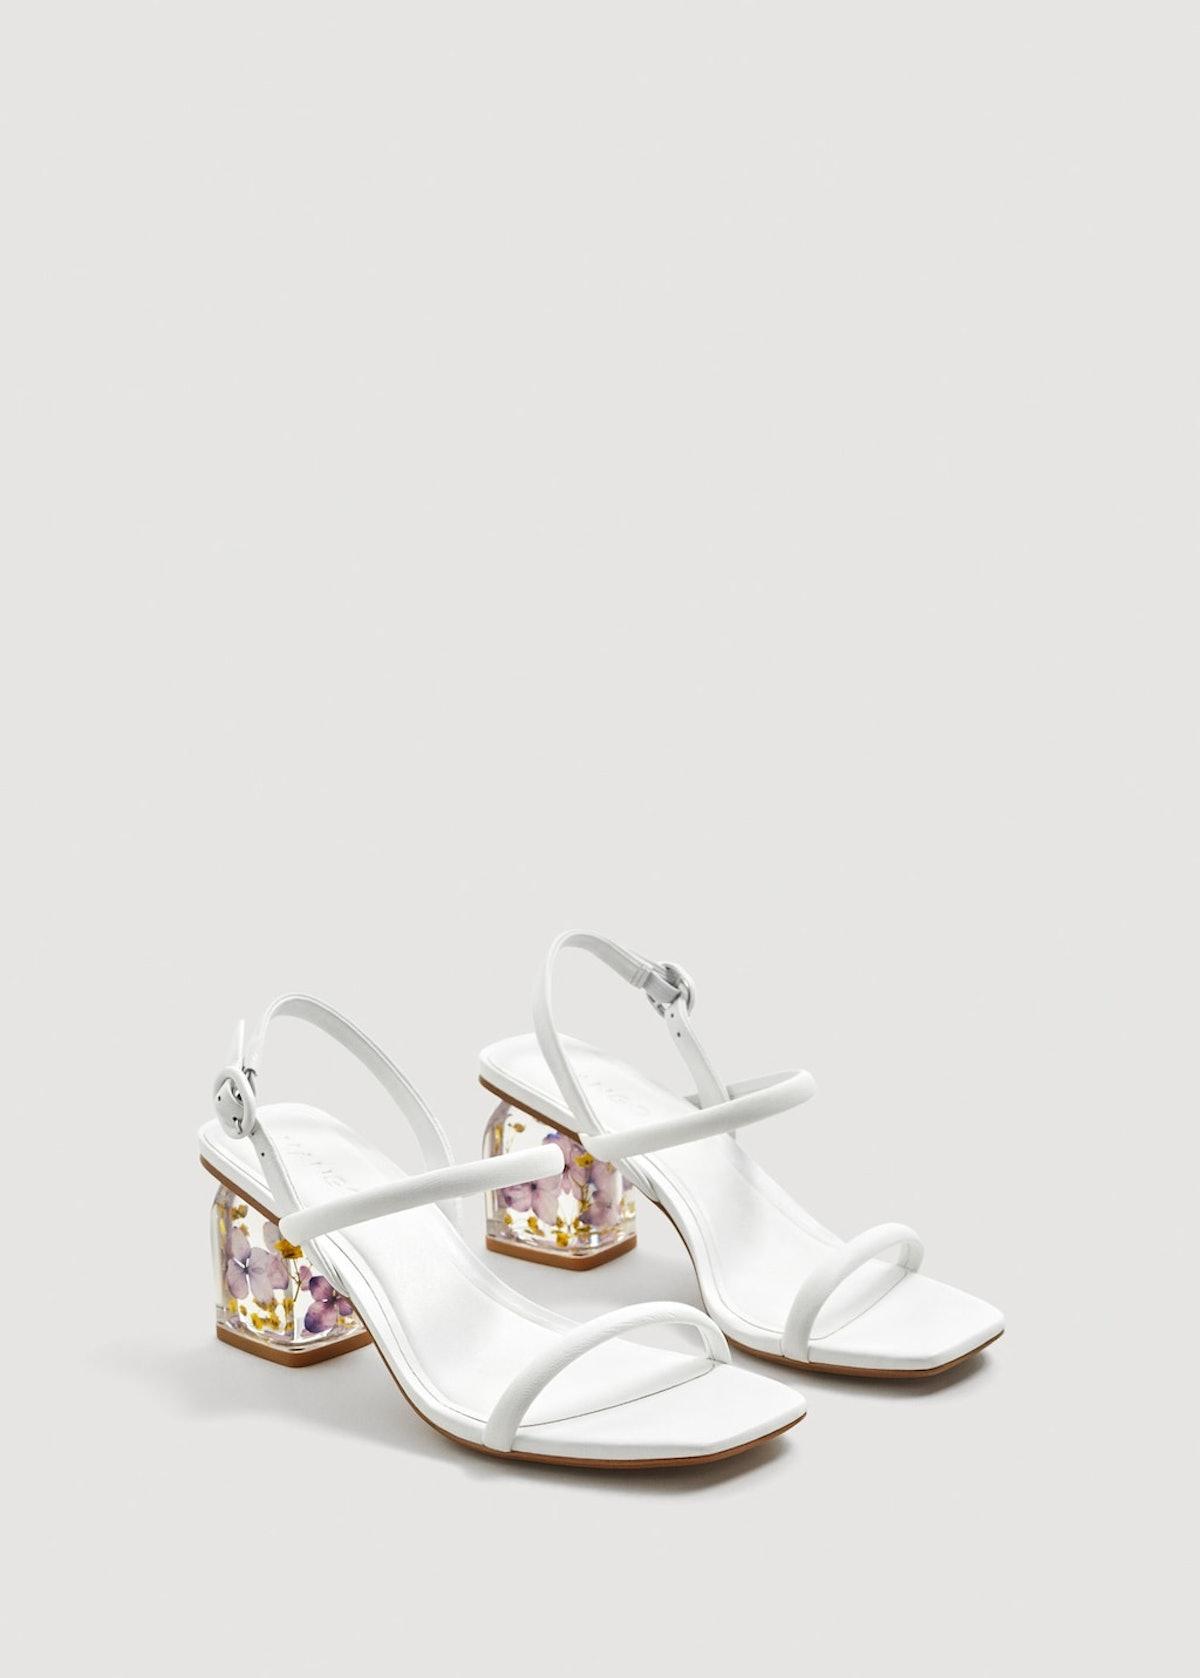 Flowered heel leather sandals